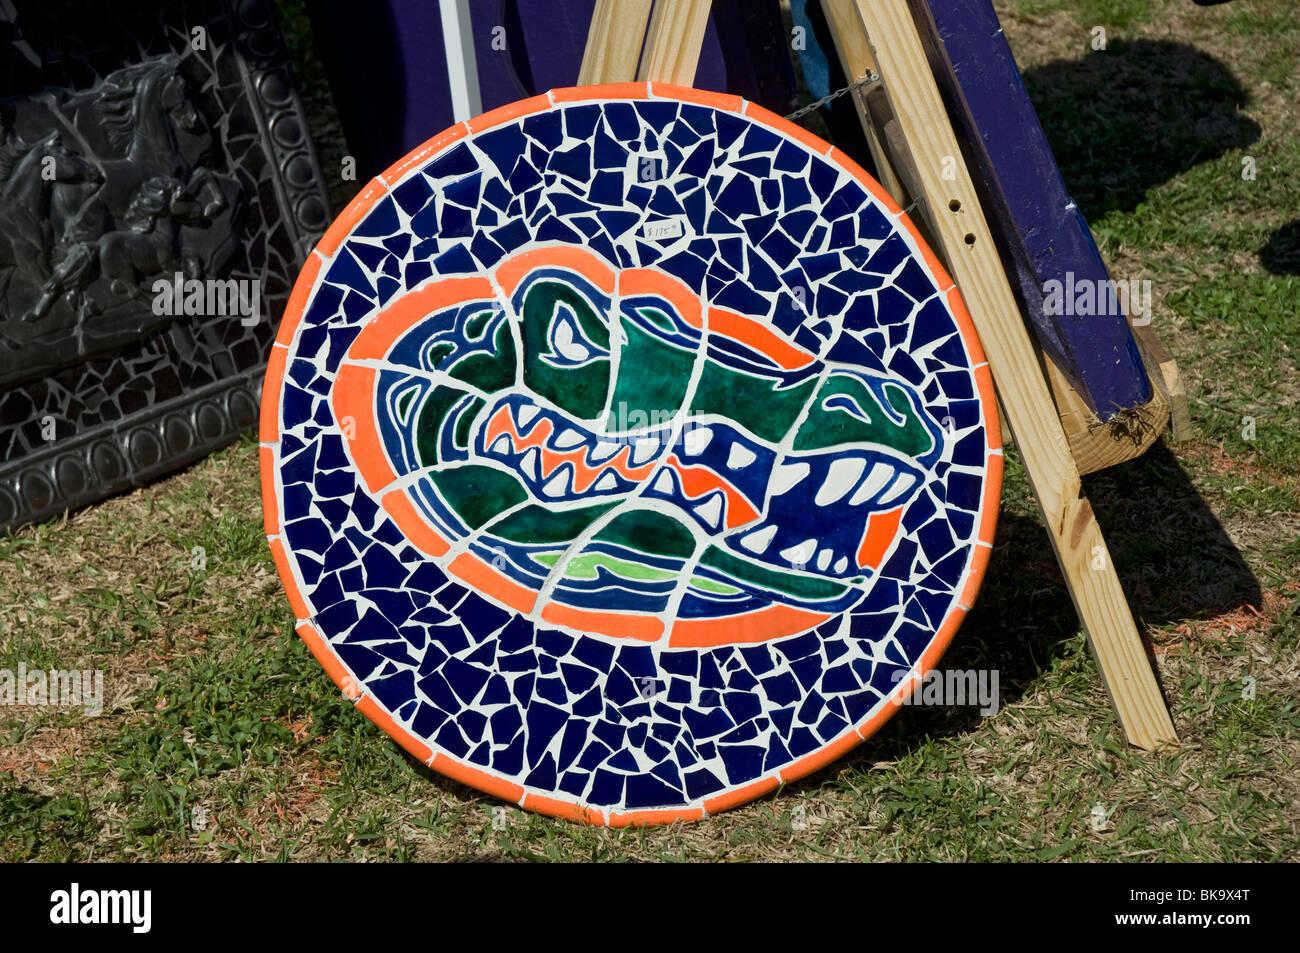 Kanapaha Spring Garden Festival Gainesville Florida Gator symbol art artwork mosaic glass pieces mascot - Stock Image